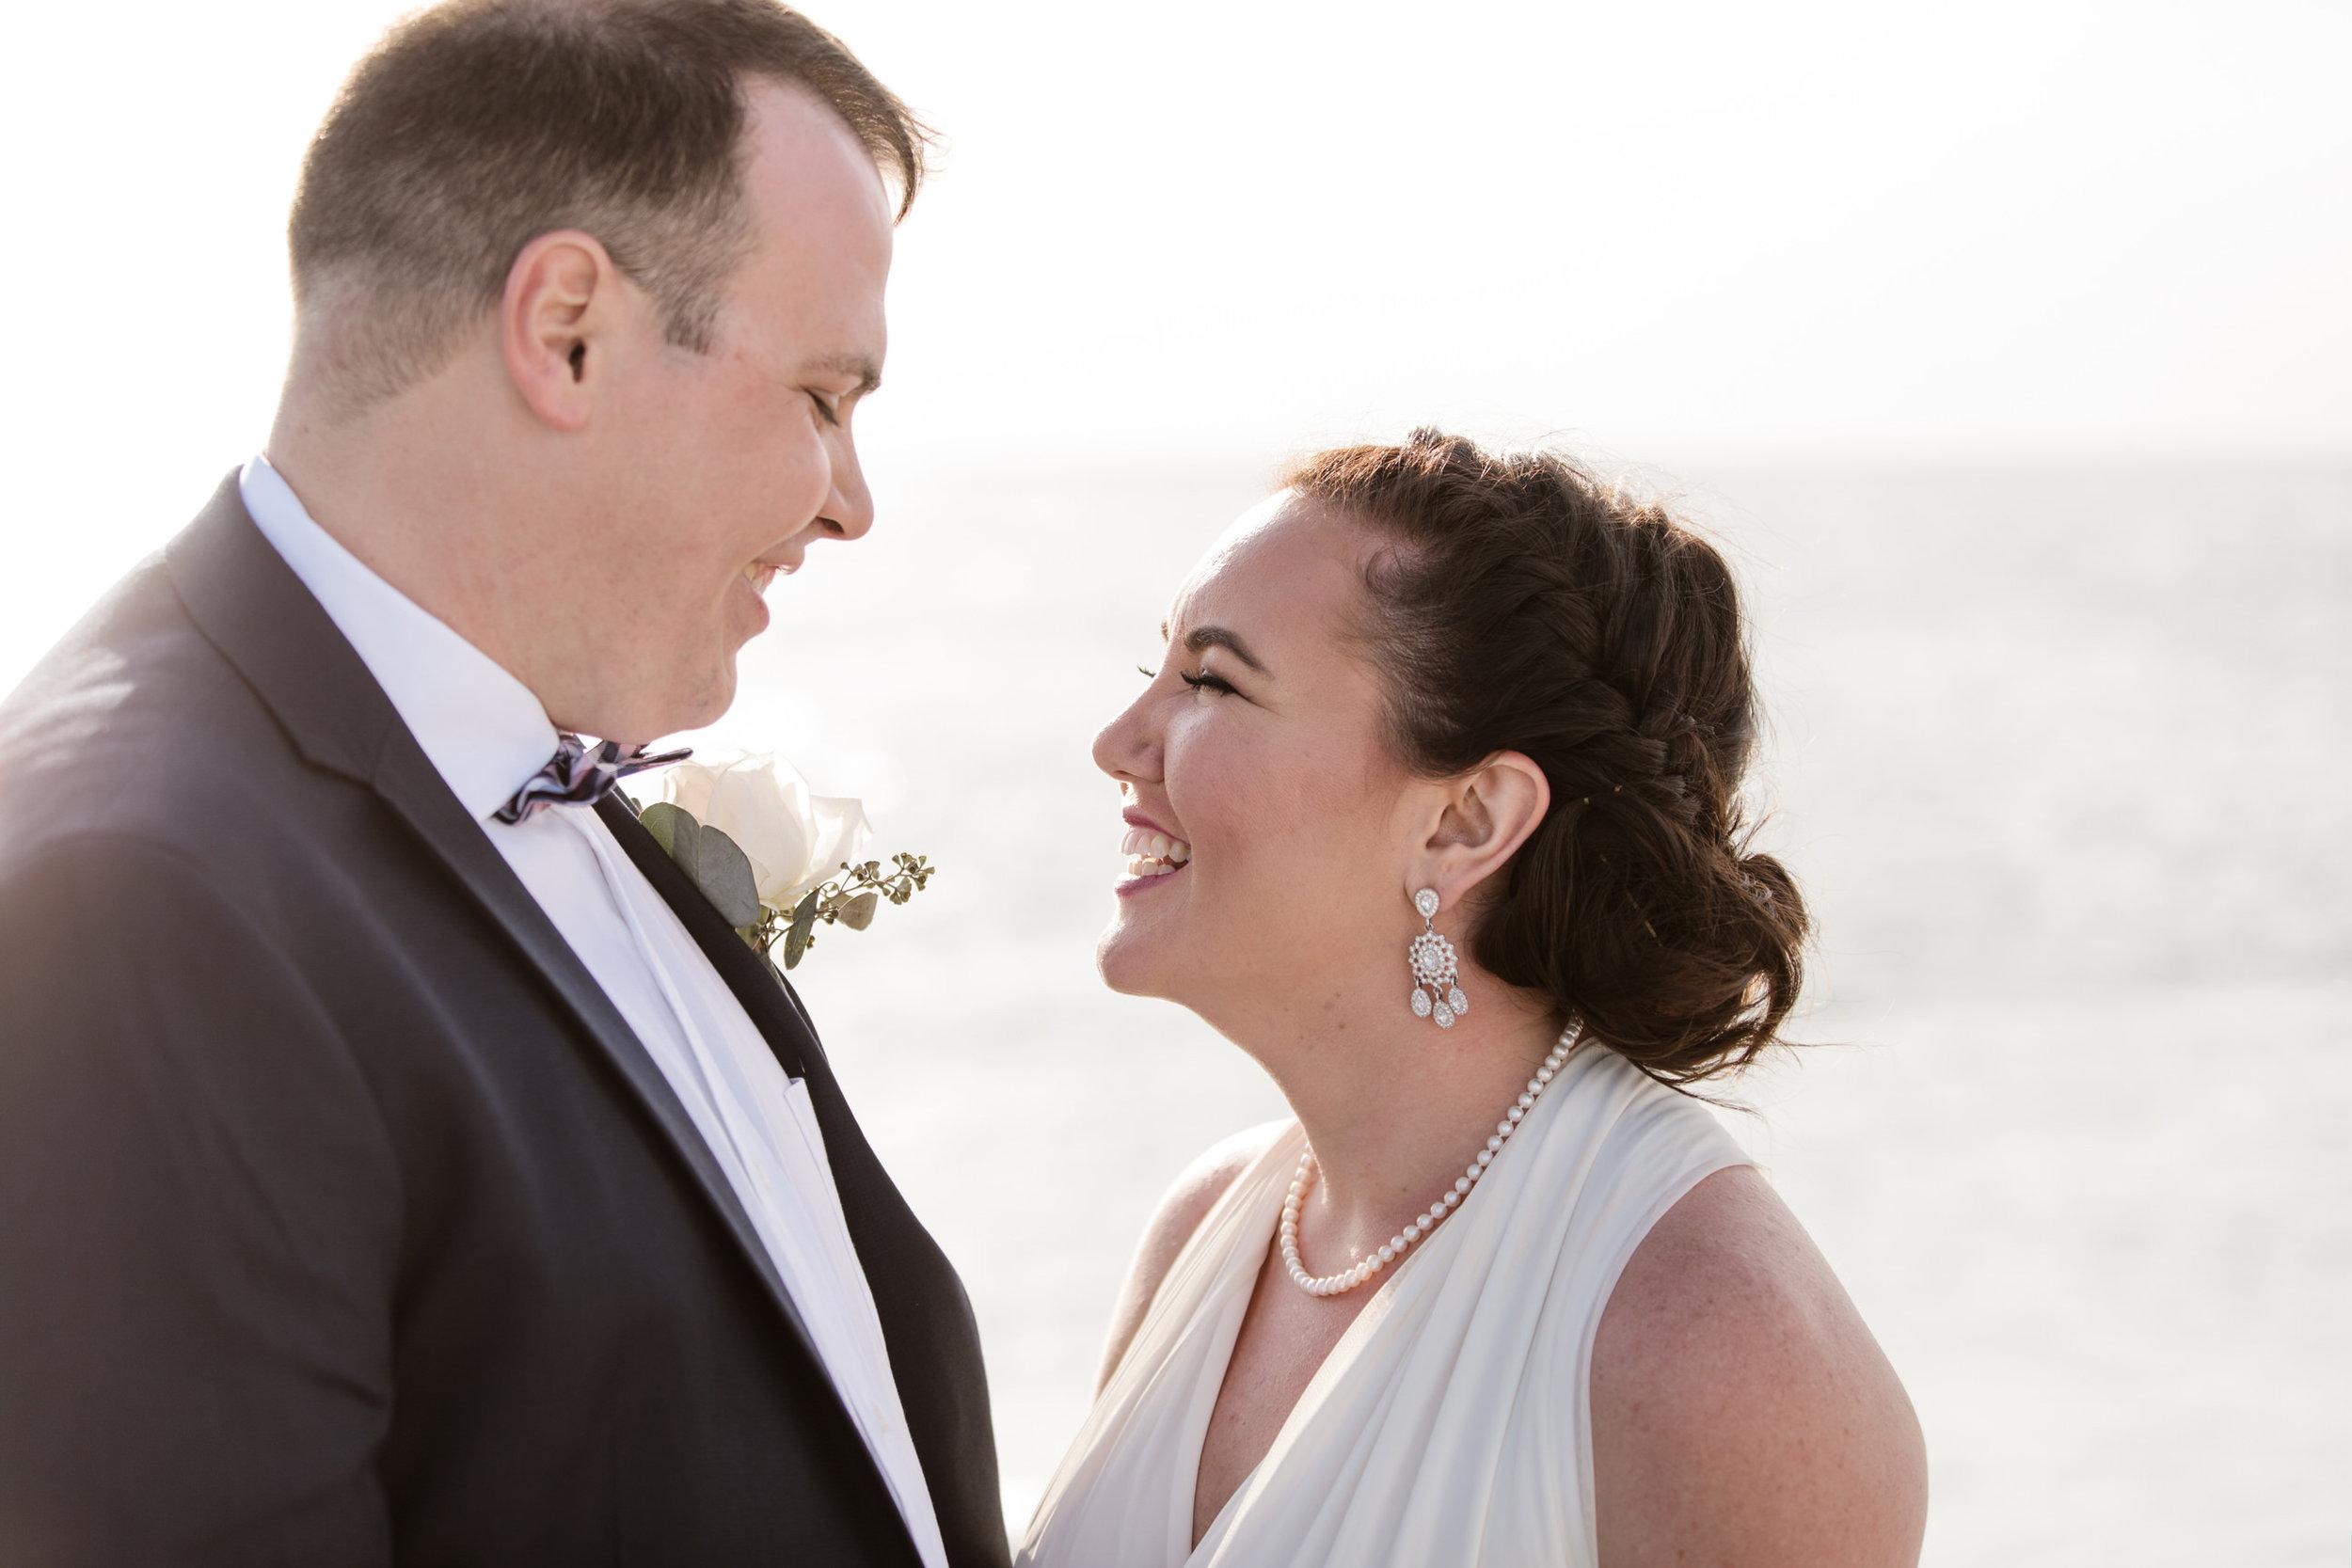 Beltran_Treasure_Island_Elopement_Tampa_Wedding_056-1.jpg